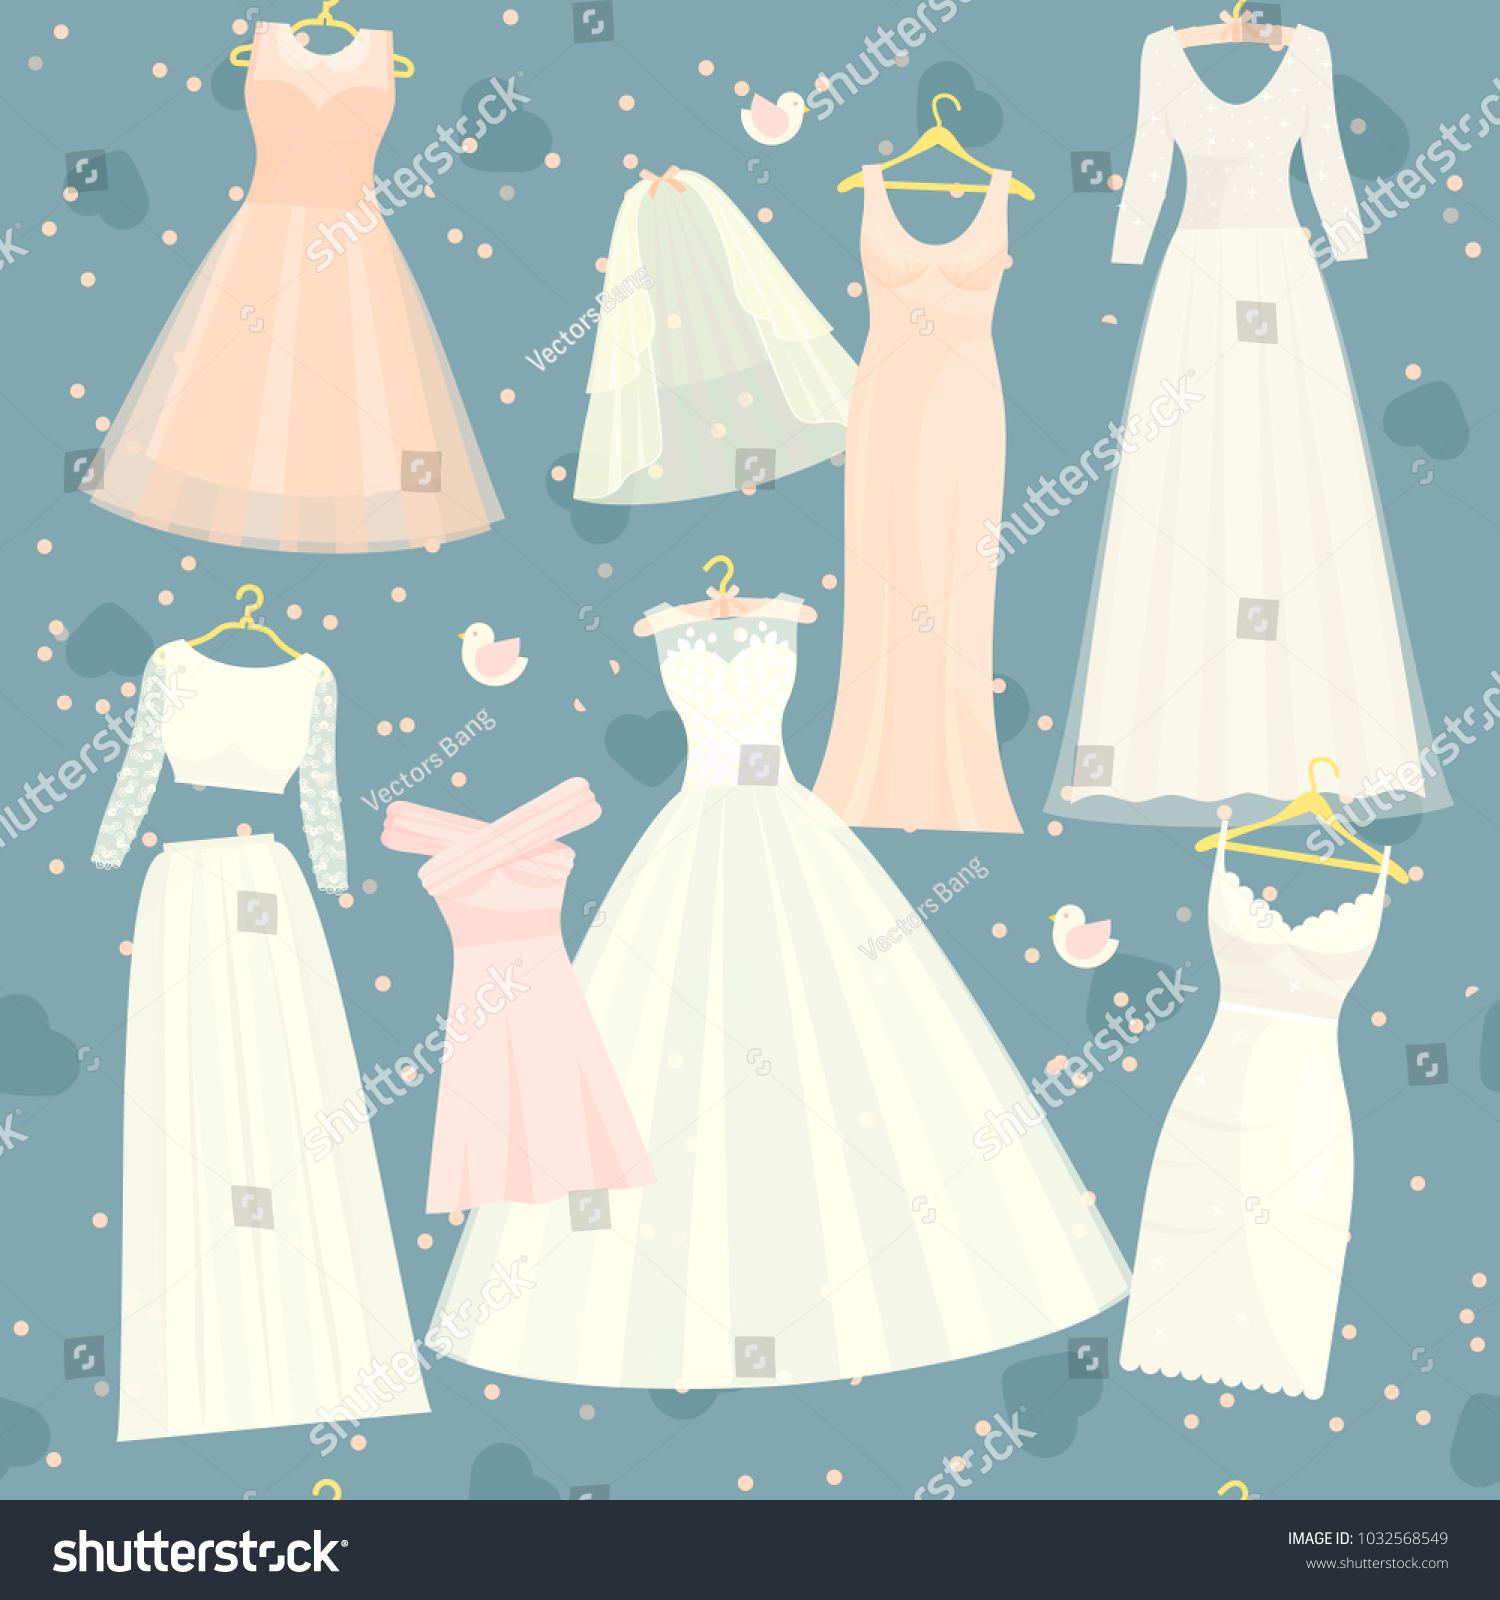 Best Wedding Dress Shops In Norwich Photos - Wedding Ideas ...